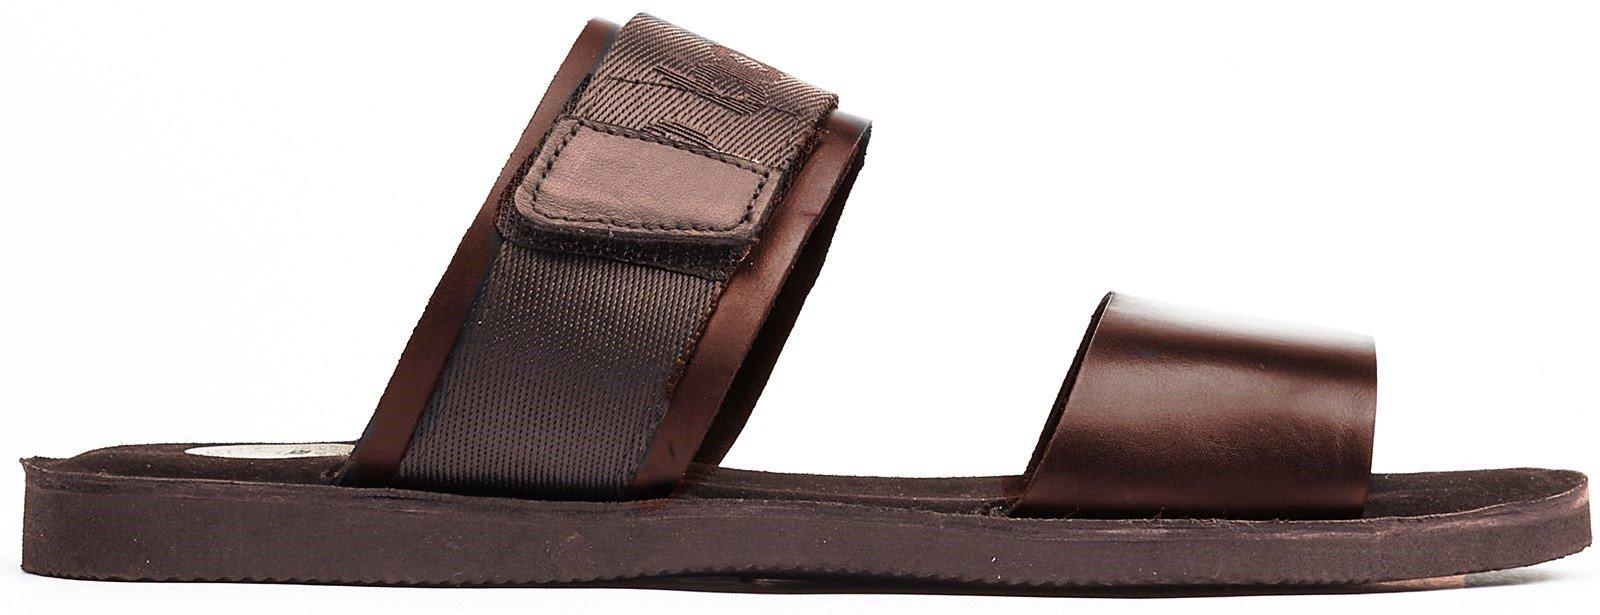 Base London Men's Katsu Slip On Sandal Various Colours 32262 - Brown 7